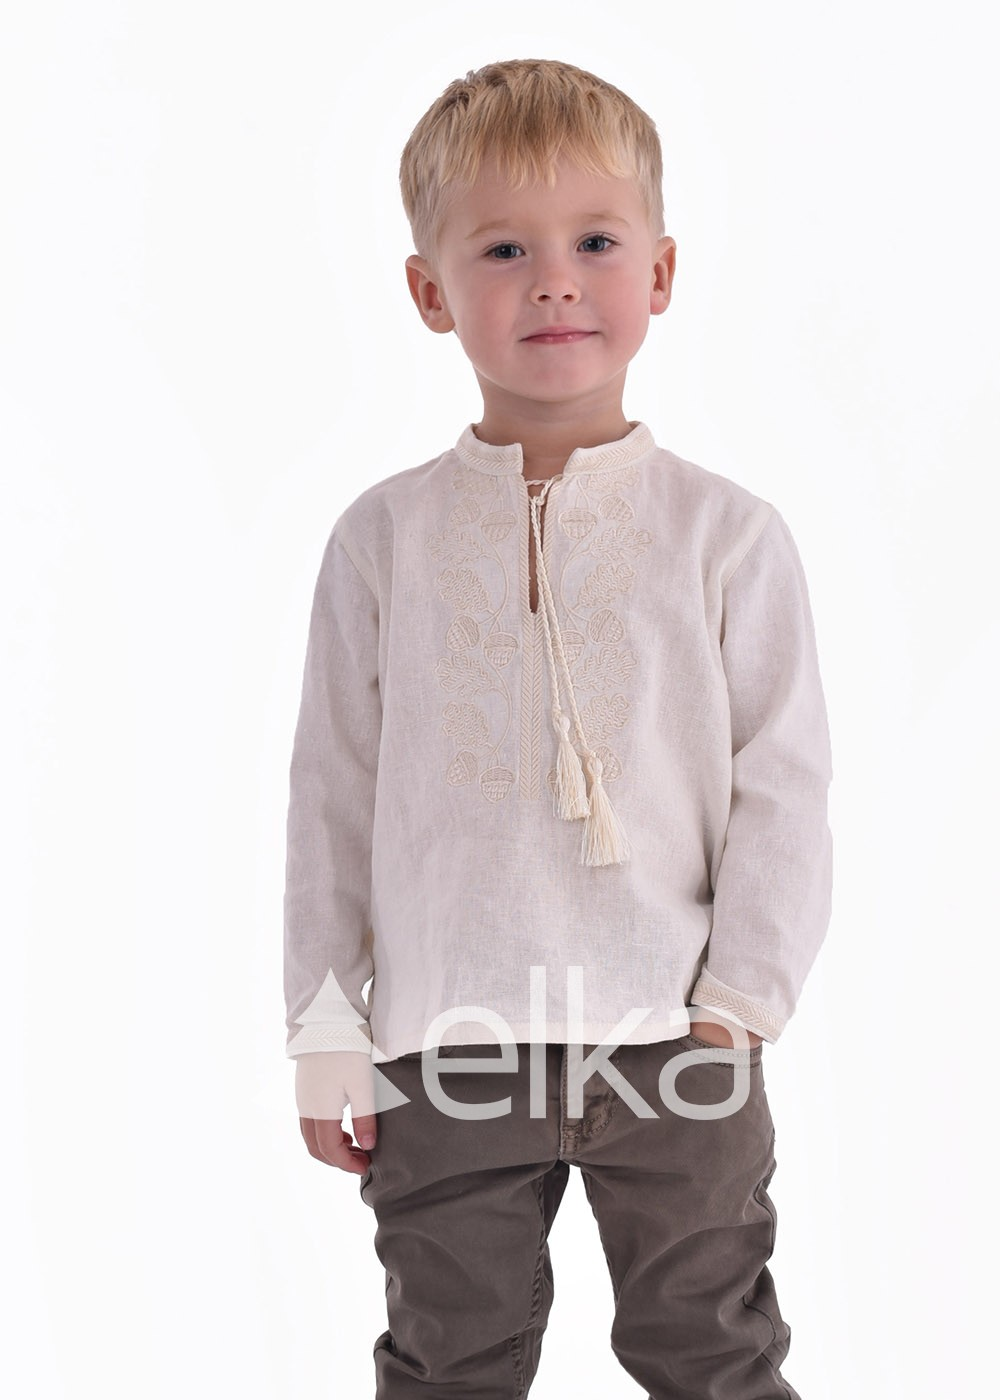 Детская вышиванка молочная